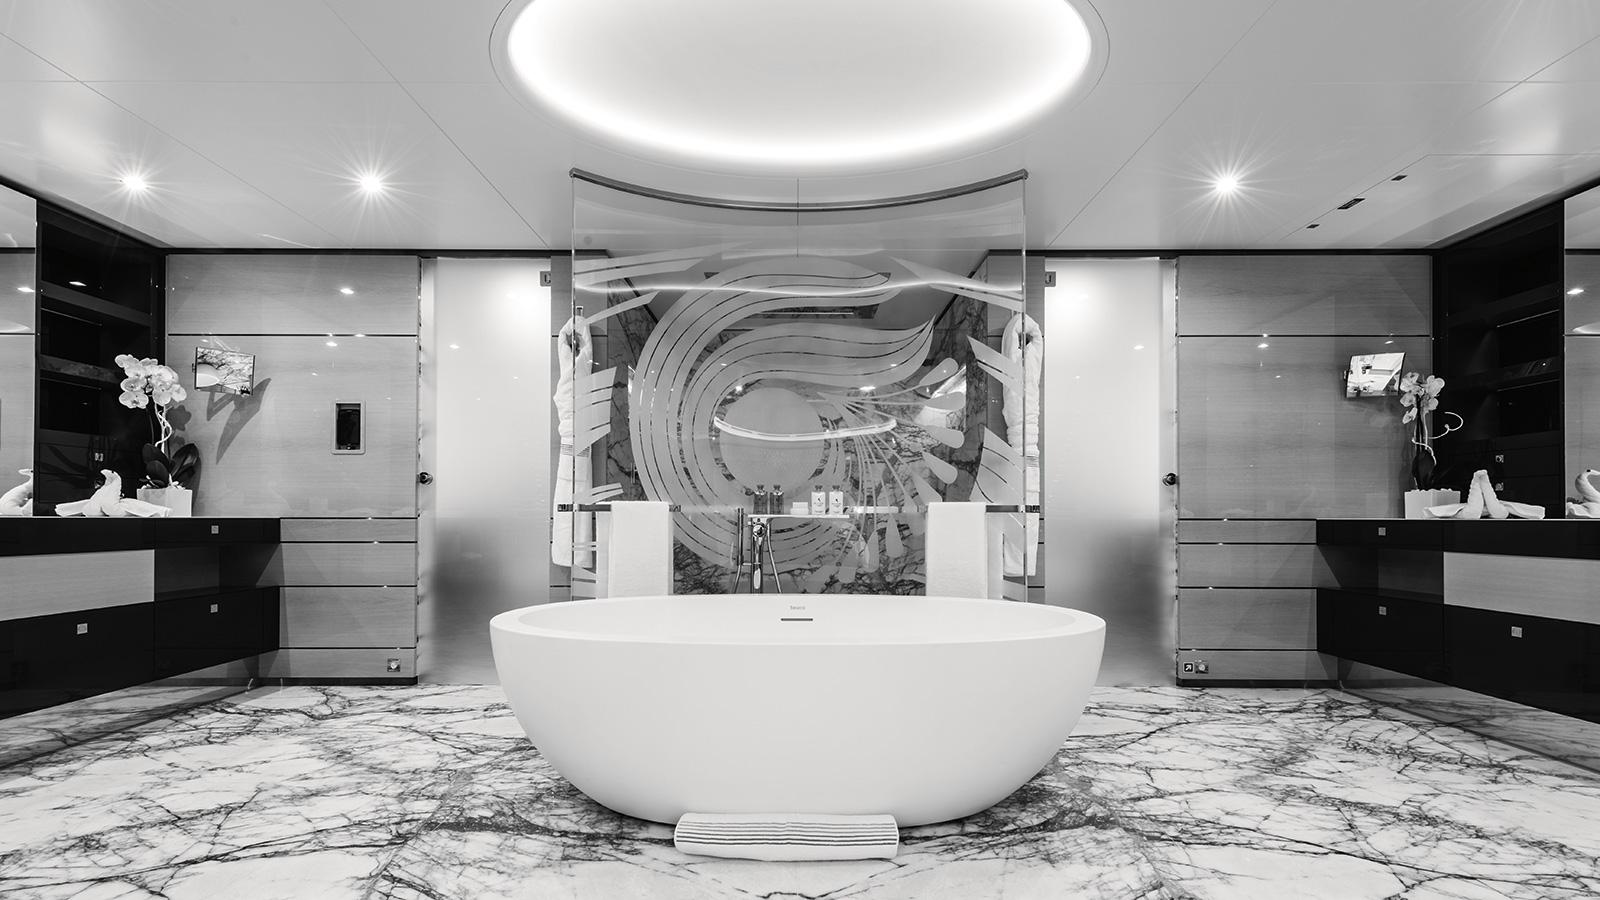 Irimari's elegant bathroom fit for royalty